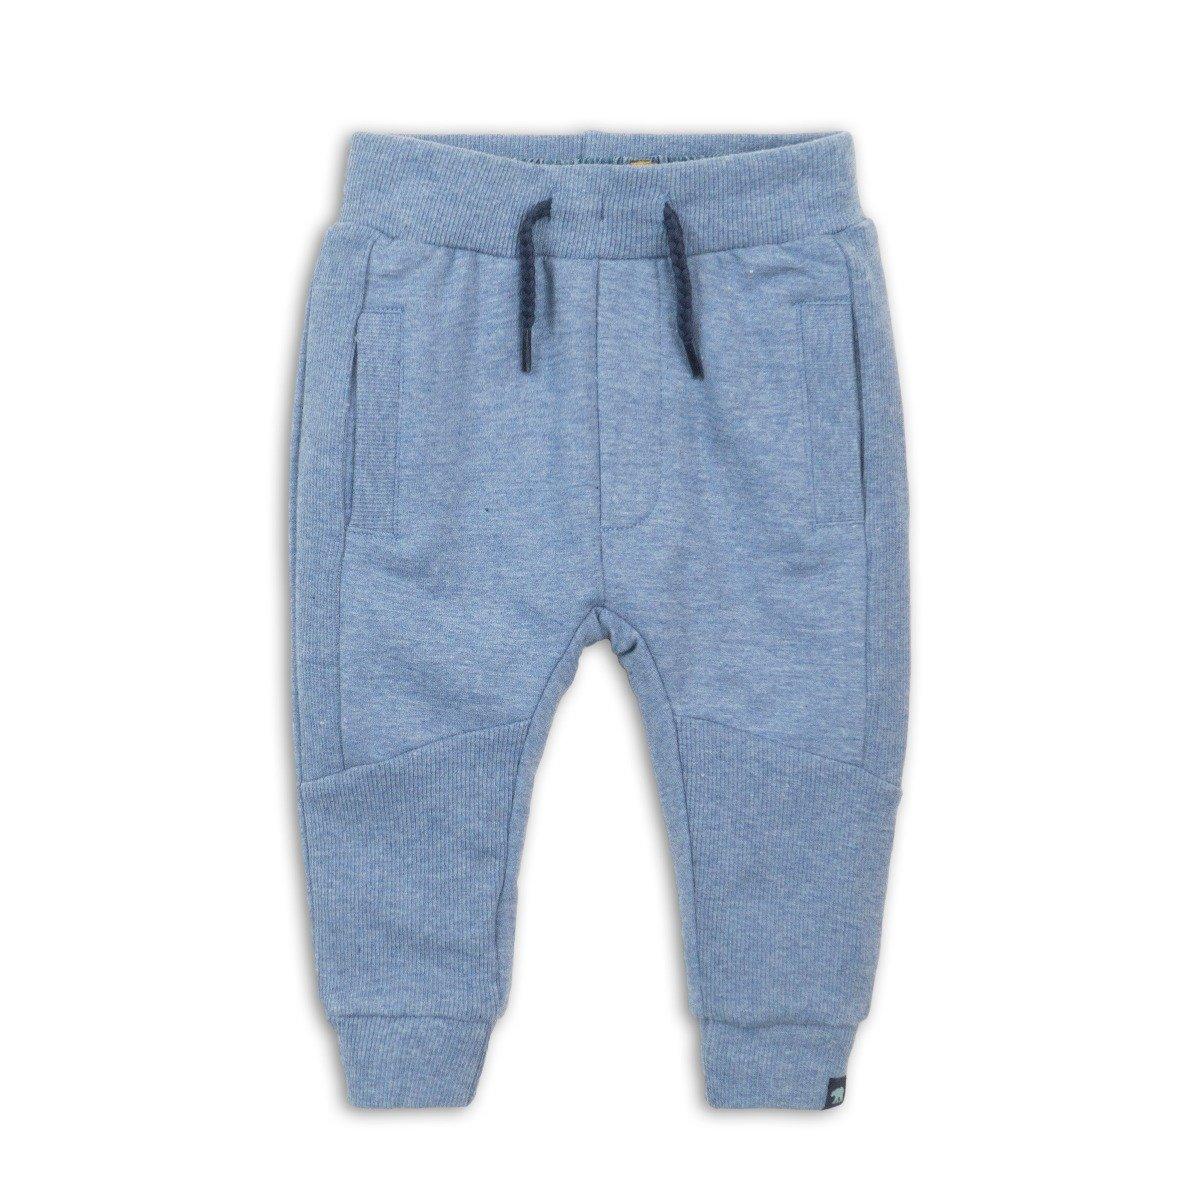 Pantaloni sport lungi cu banda elastica Cool boy Dirkje